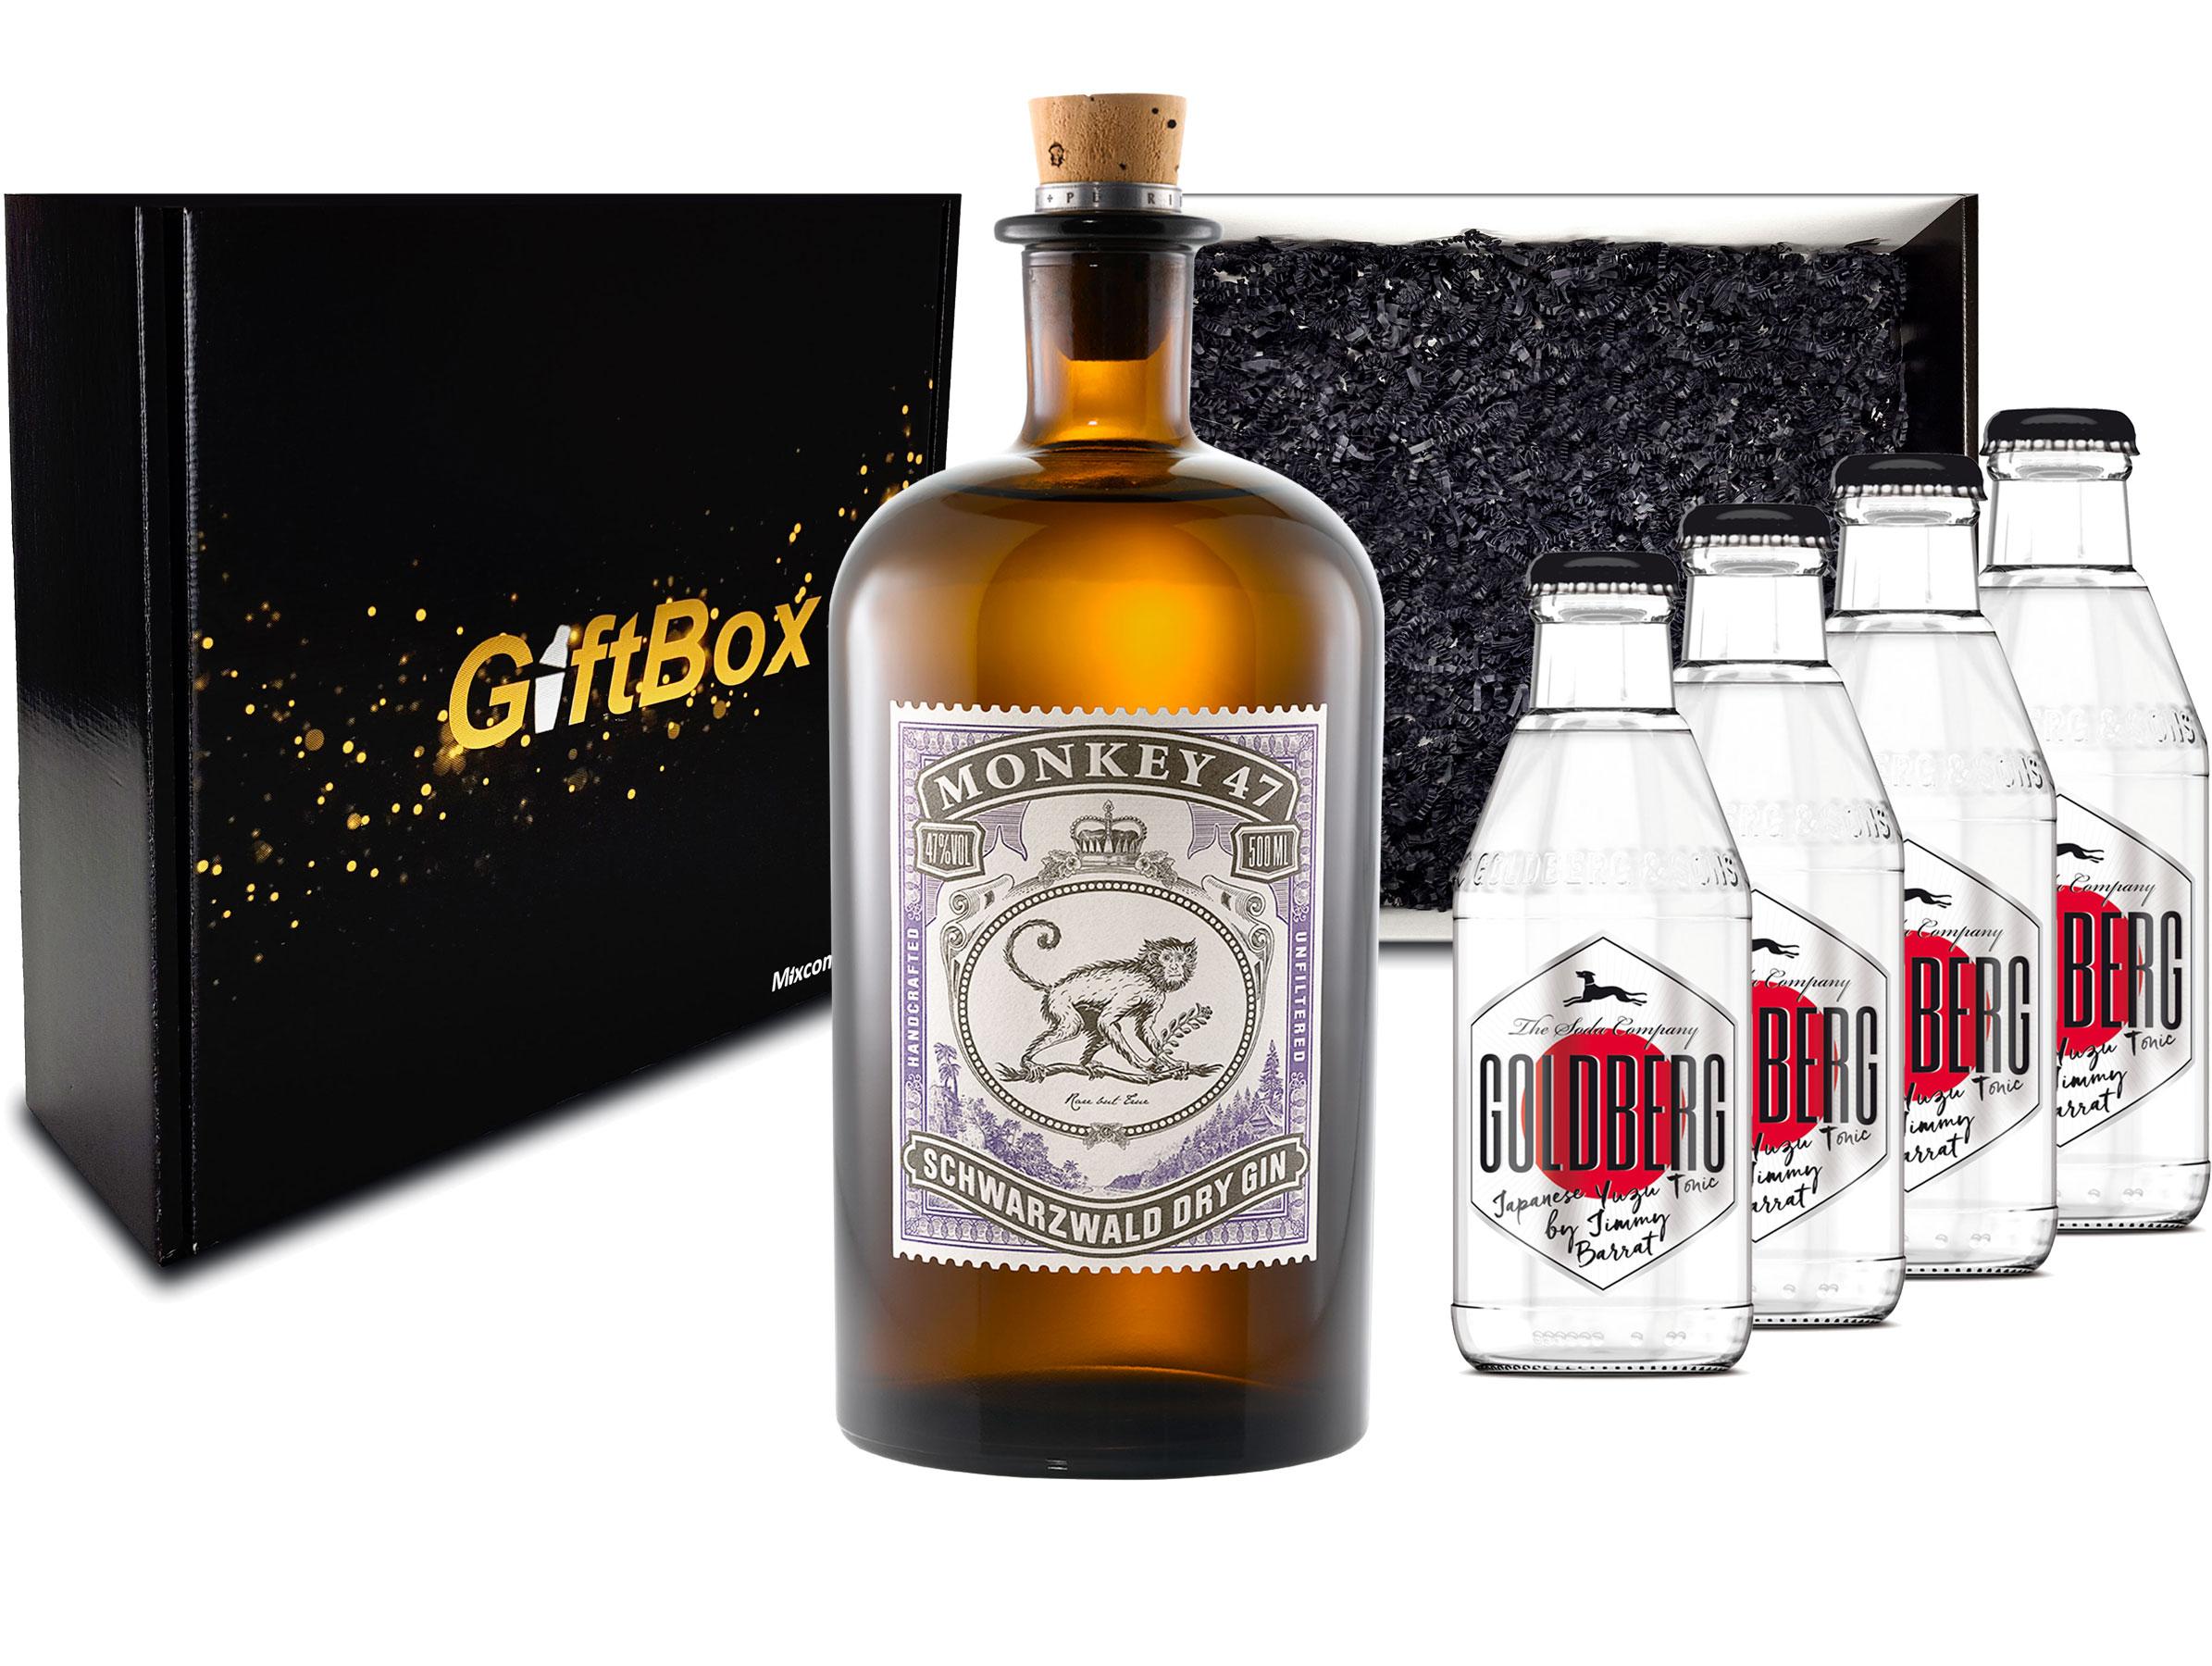 Gin Tonic Set Giftbox Geschenkset - Monkey 47 Schwarzwald Dry Gin 0,5l (47% Vol) + 4x Goldberg Japanese Yuzu Tonic Water 200ml inkl. Pfand MEHRWEG -[Enthält Sulfite]